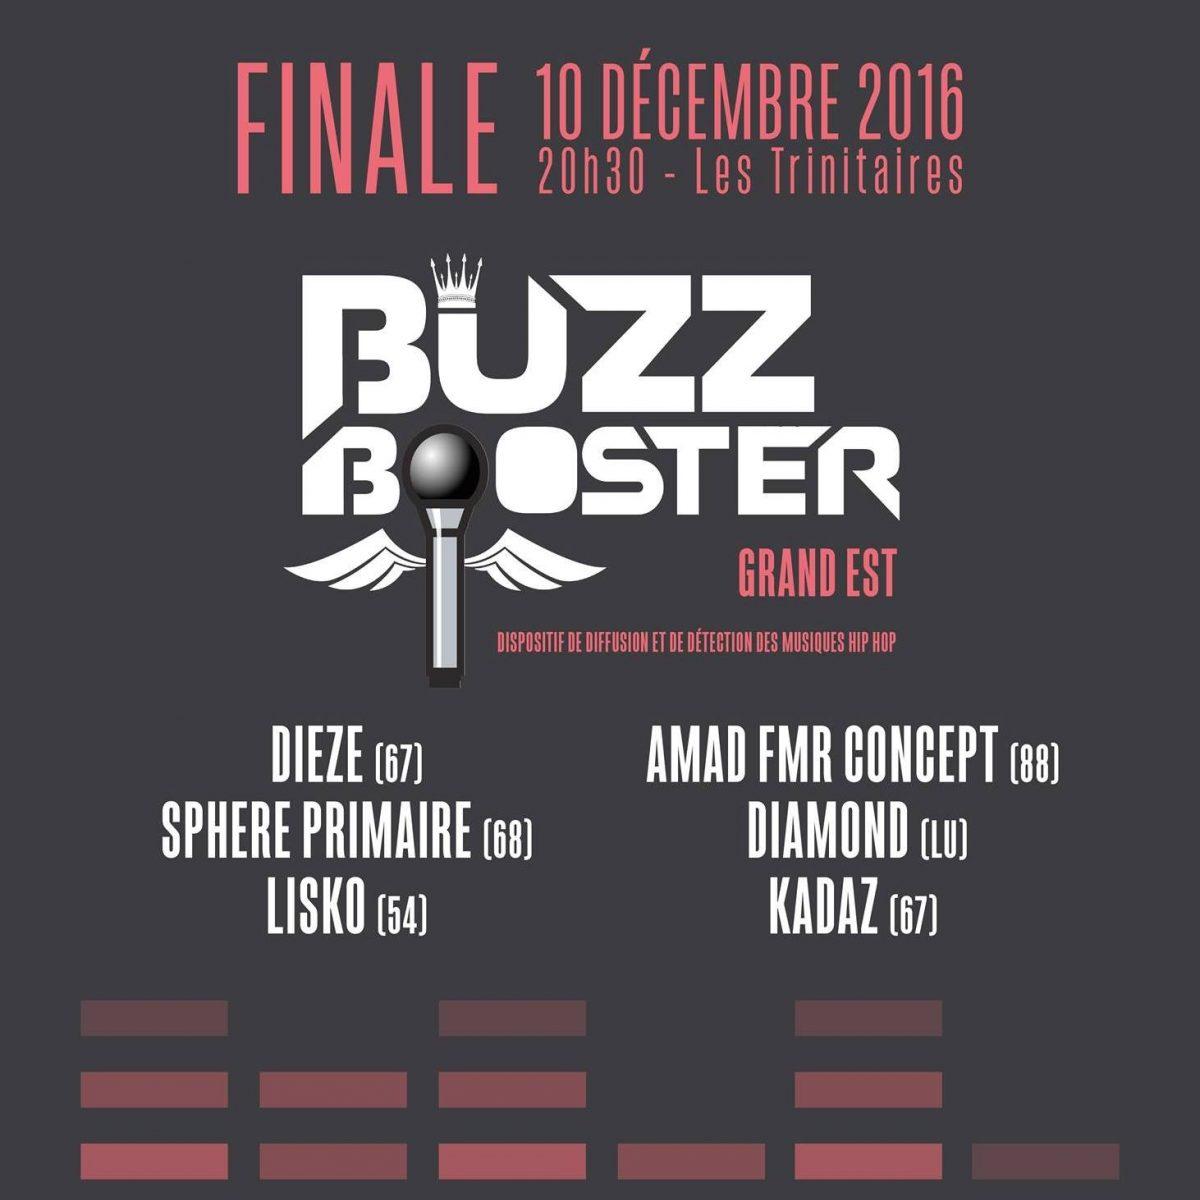 Buzz Booster Grand Est